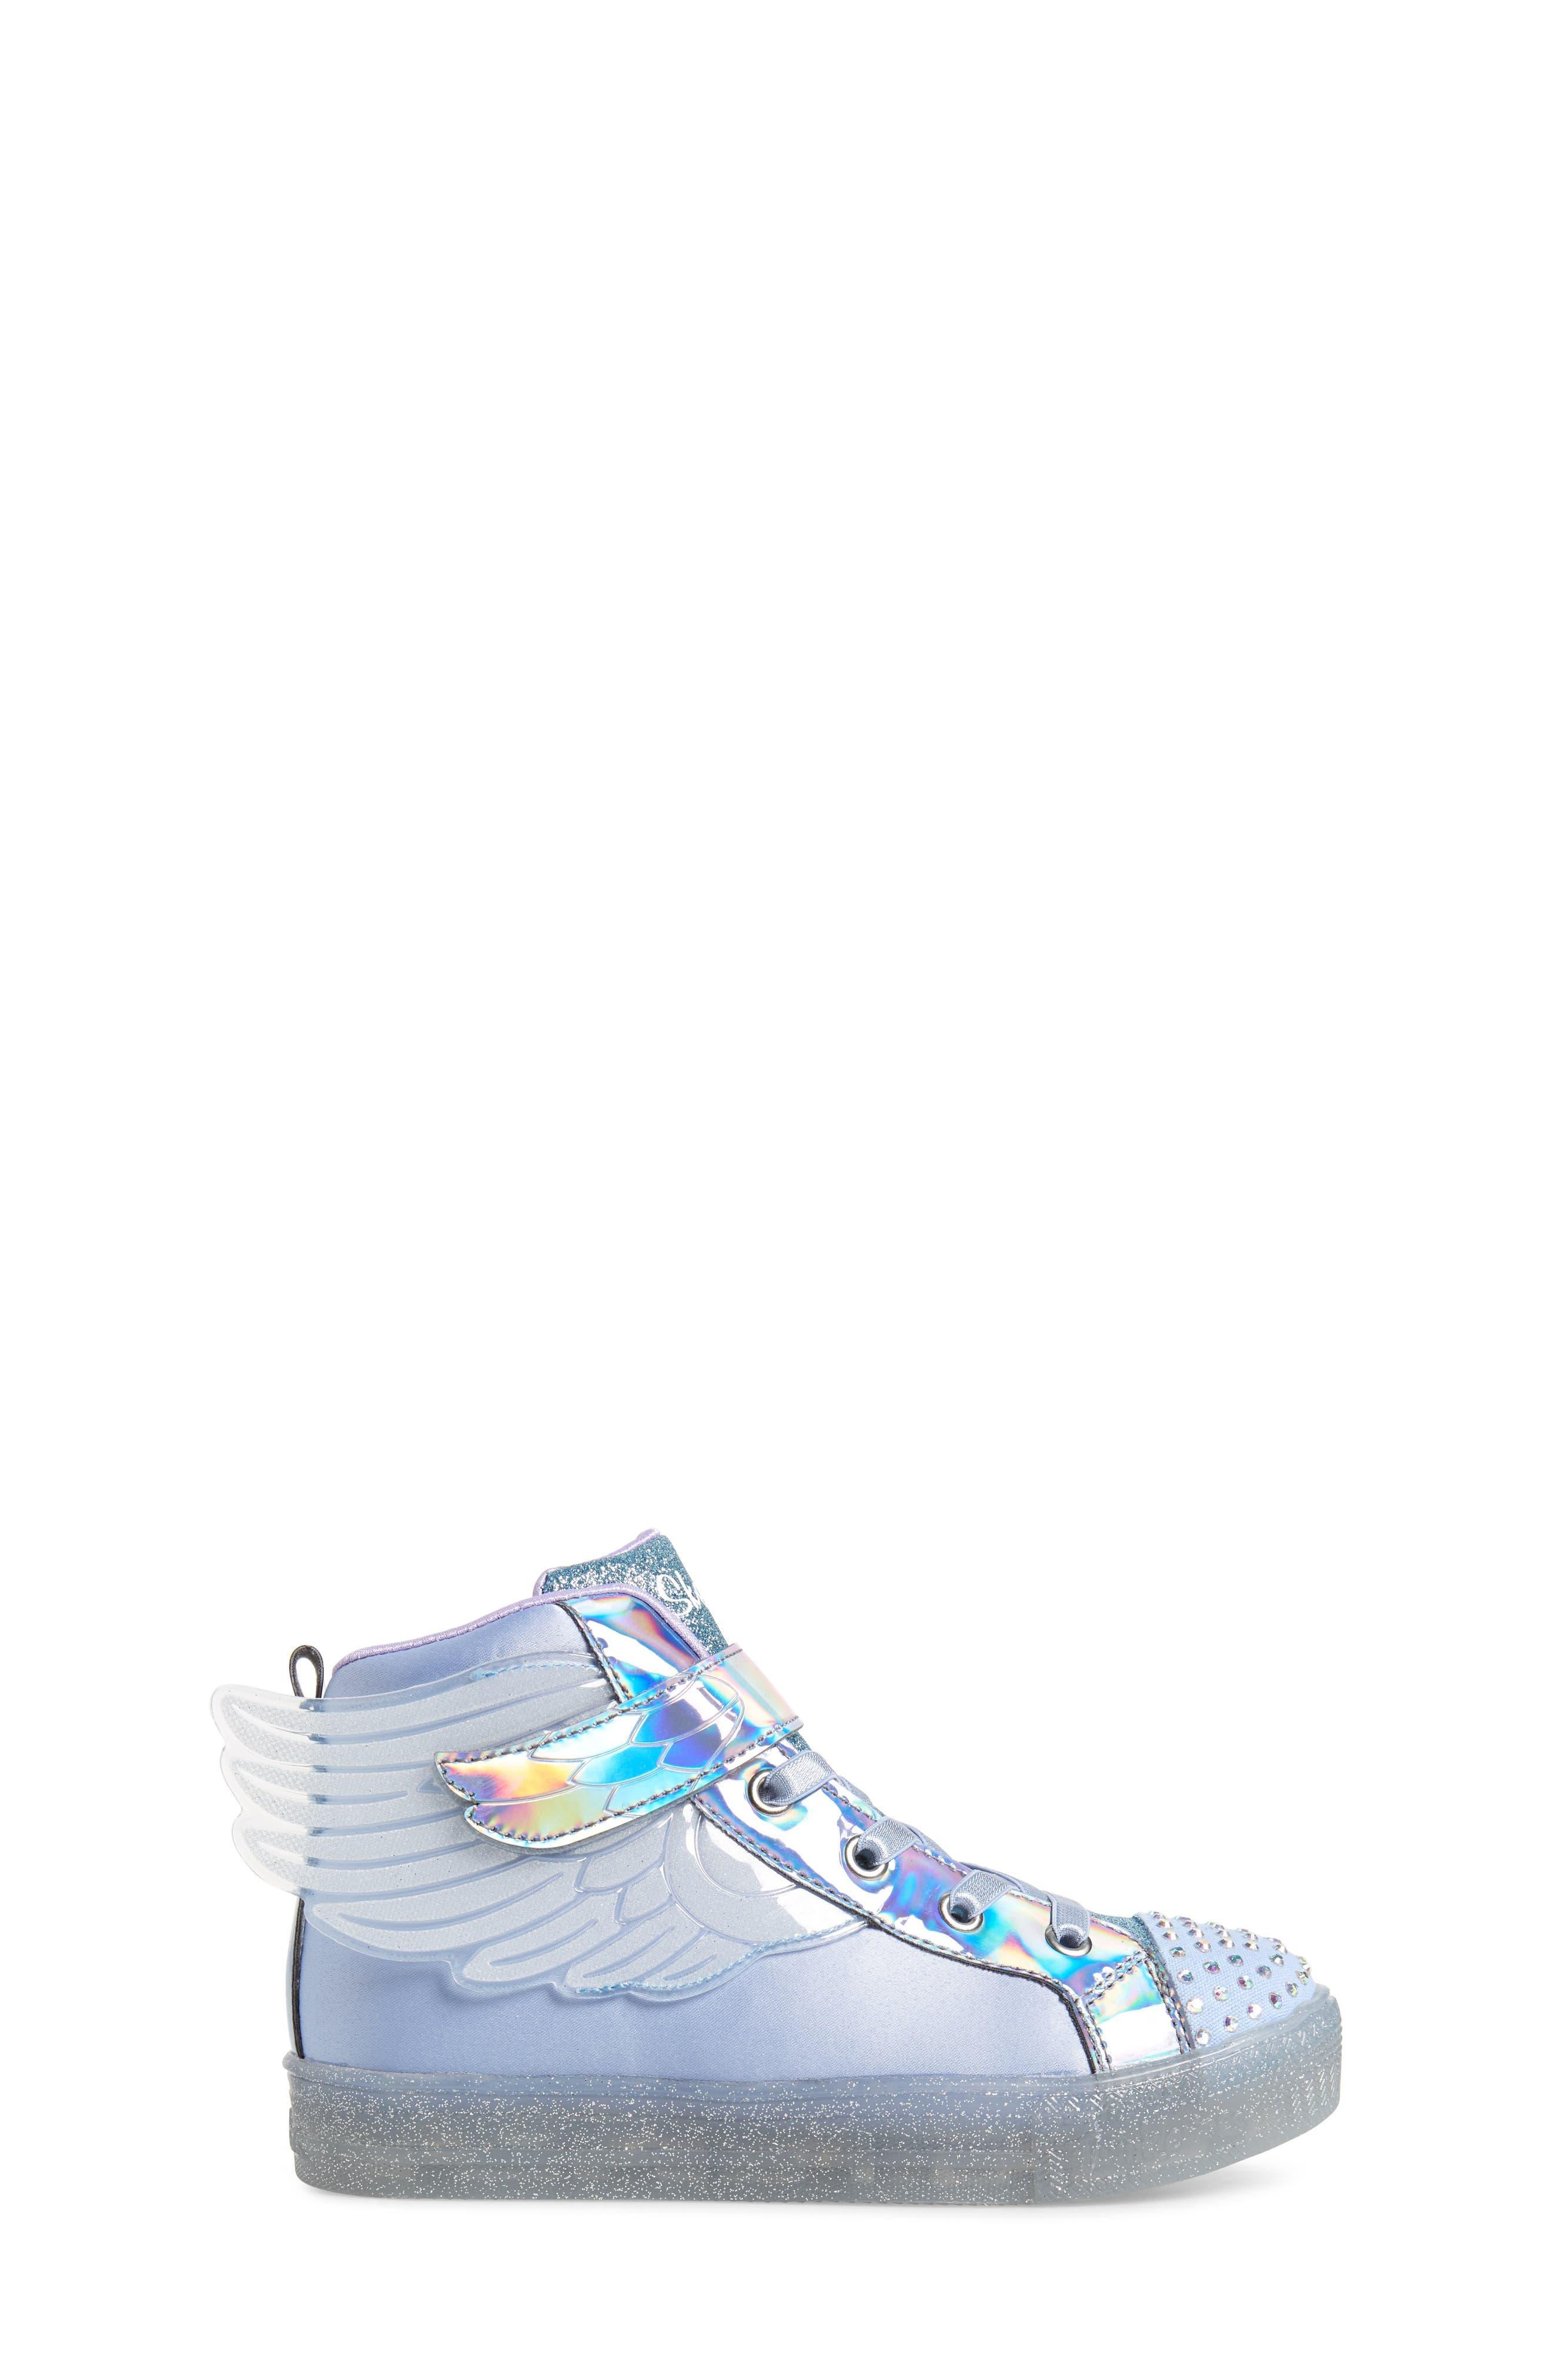 SKECHERS, Twinkle Toes Light-Up Sneaker, Alternate thumbnail 3, color, PERIWINKLE